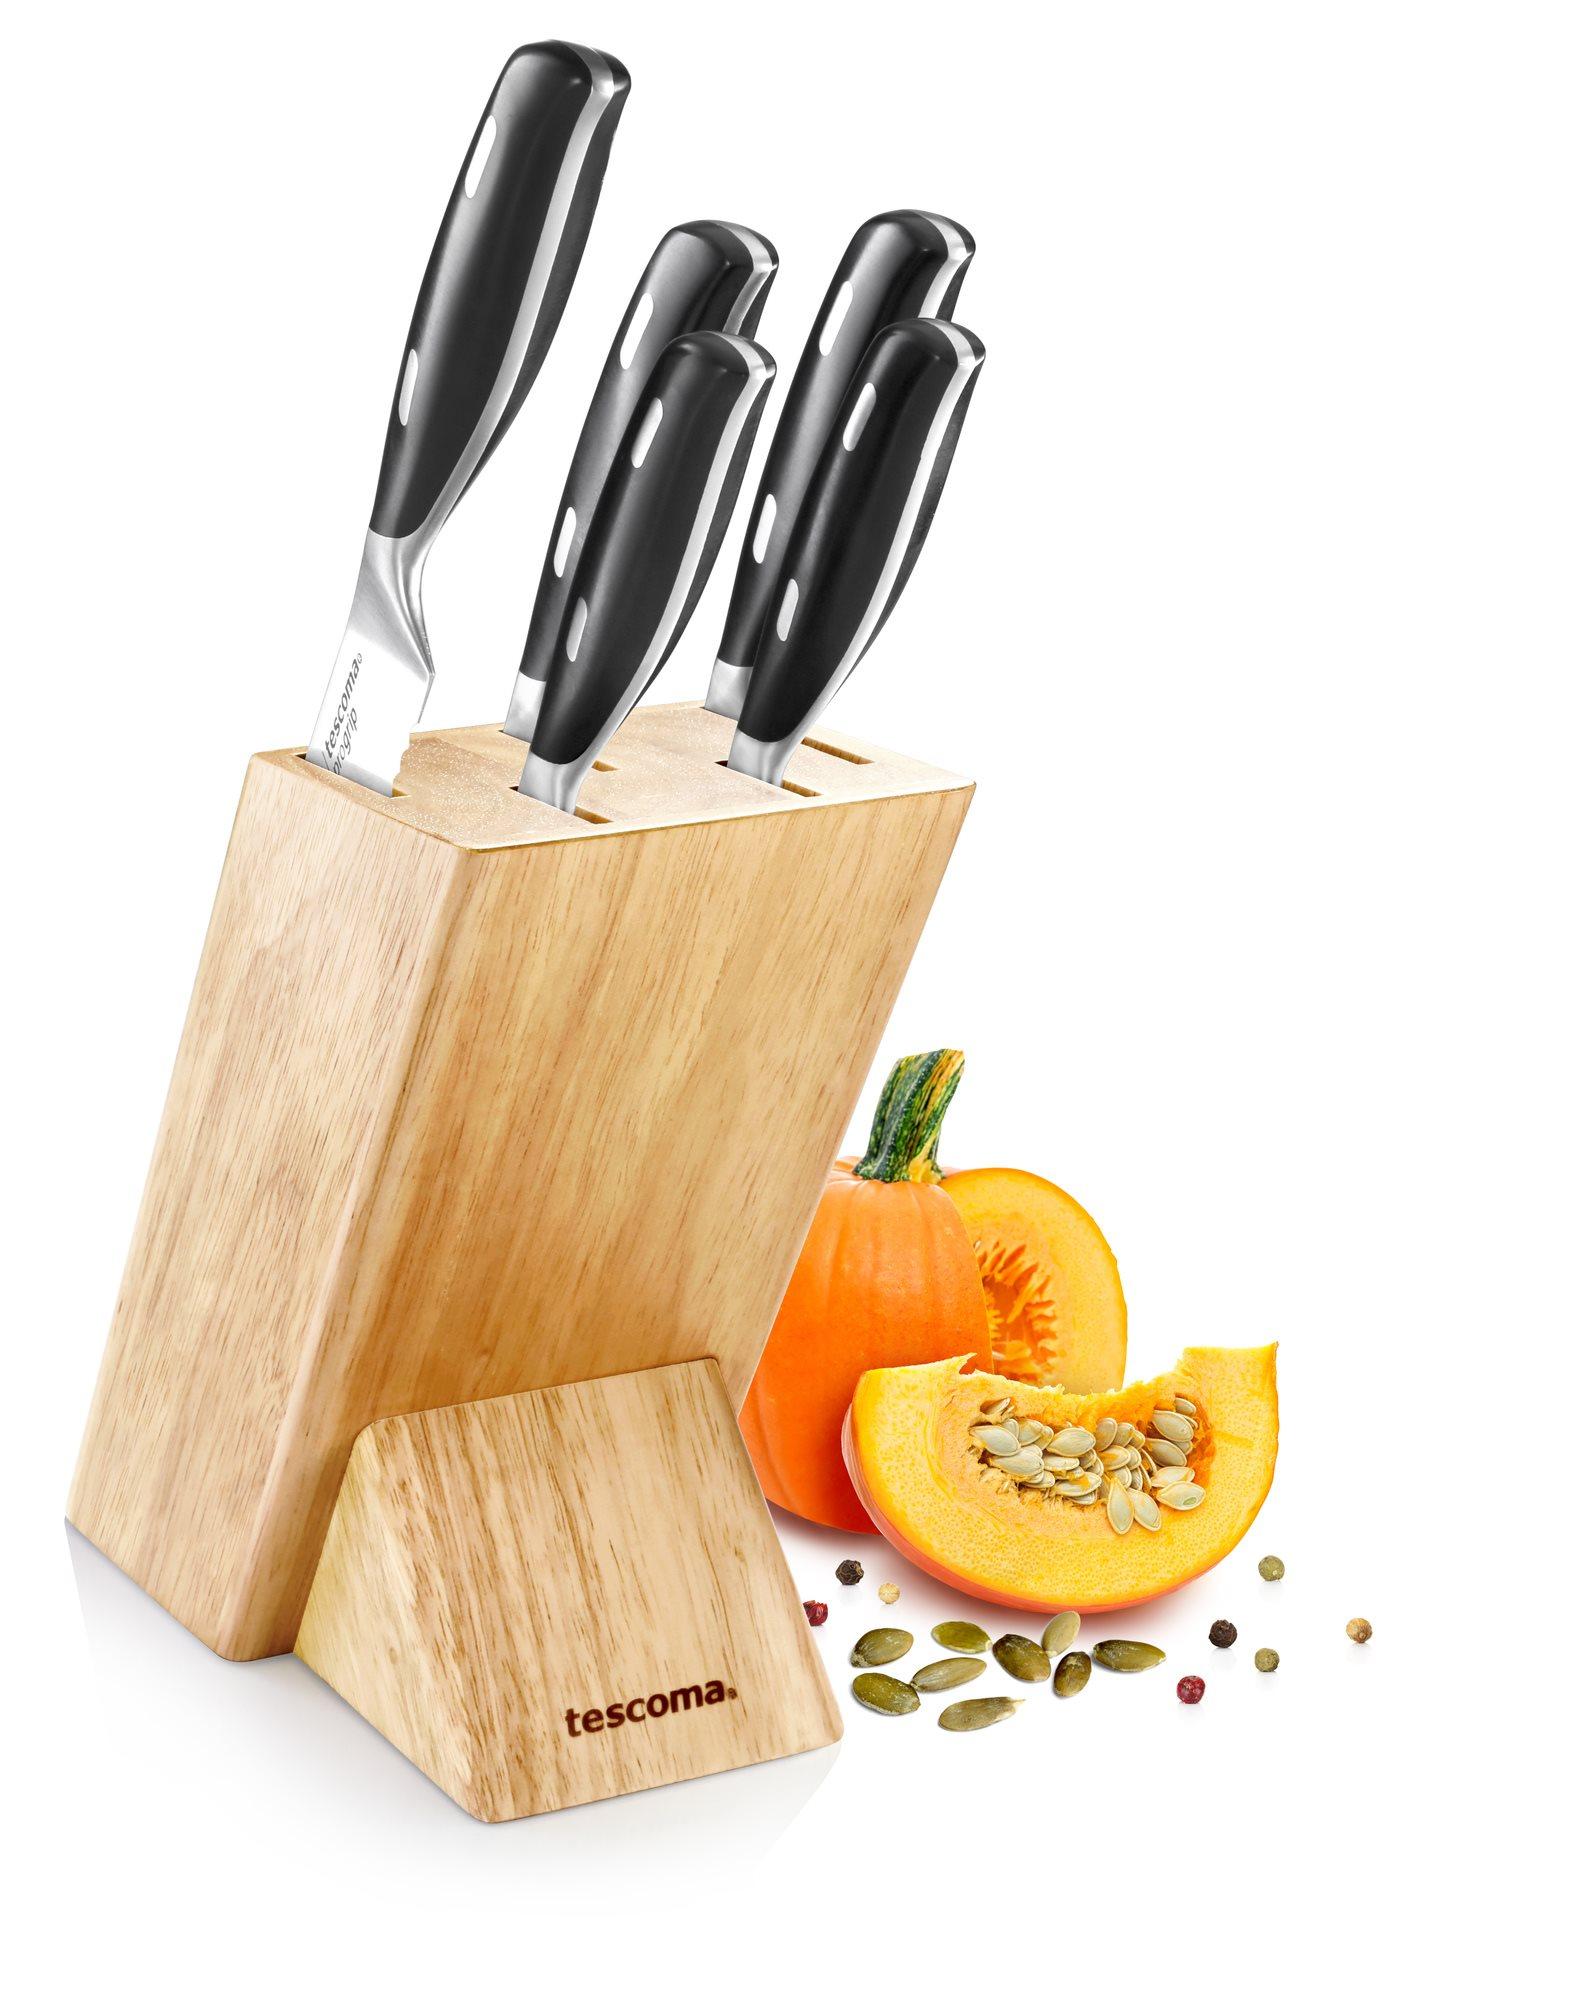 Tescoma Σετ Ξύλινη Βάση & 5 Μαχαίρια Grand Chef